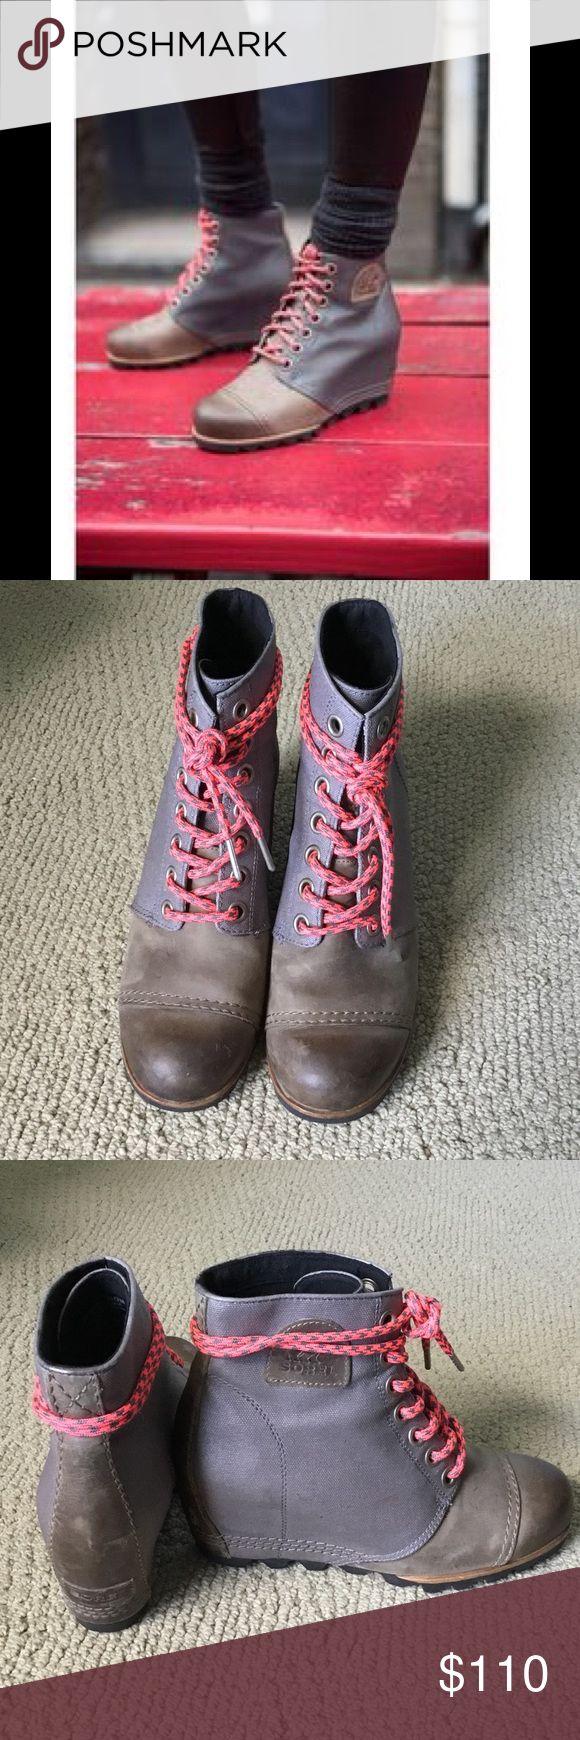 SALE SOREL 1964 premium wedge booties ingrey/brown Gently worn size 9 amazing SOREL wedge booties! Sorel Shoes Ankle Boots & Booties